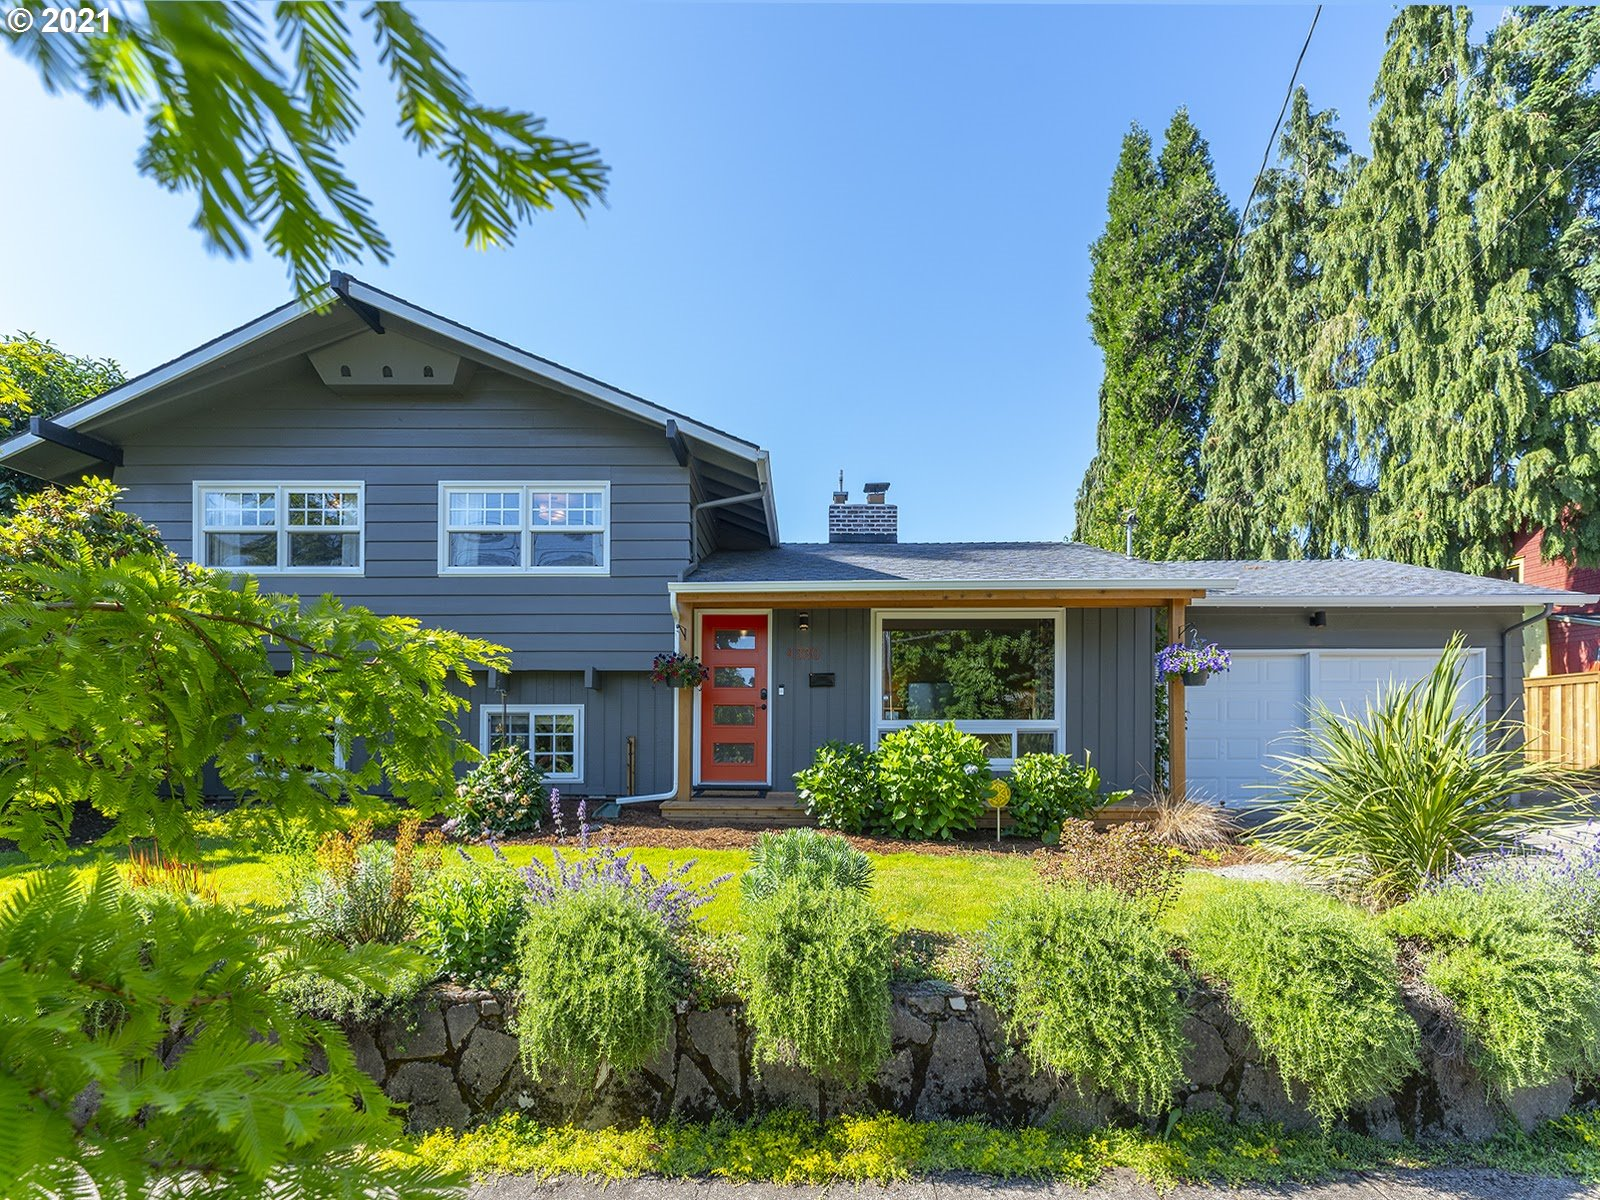 4330 SE RAYMOND ST, Portland OR 97206